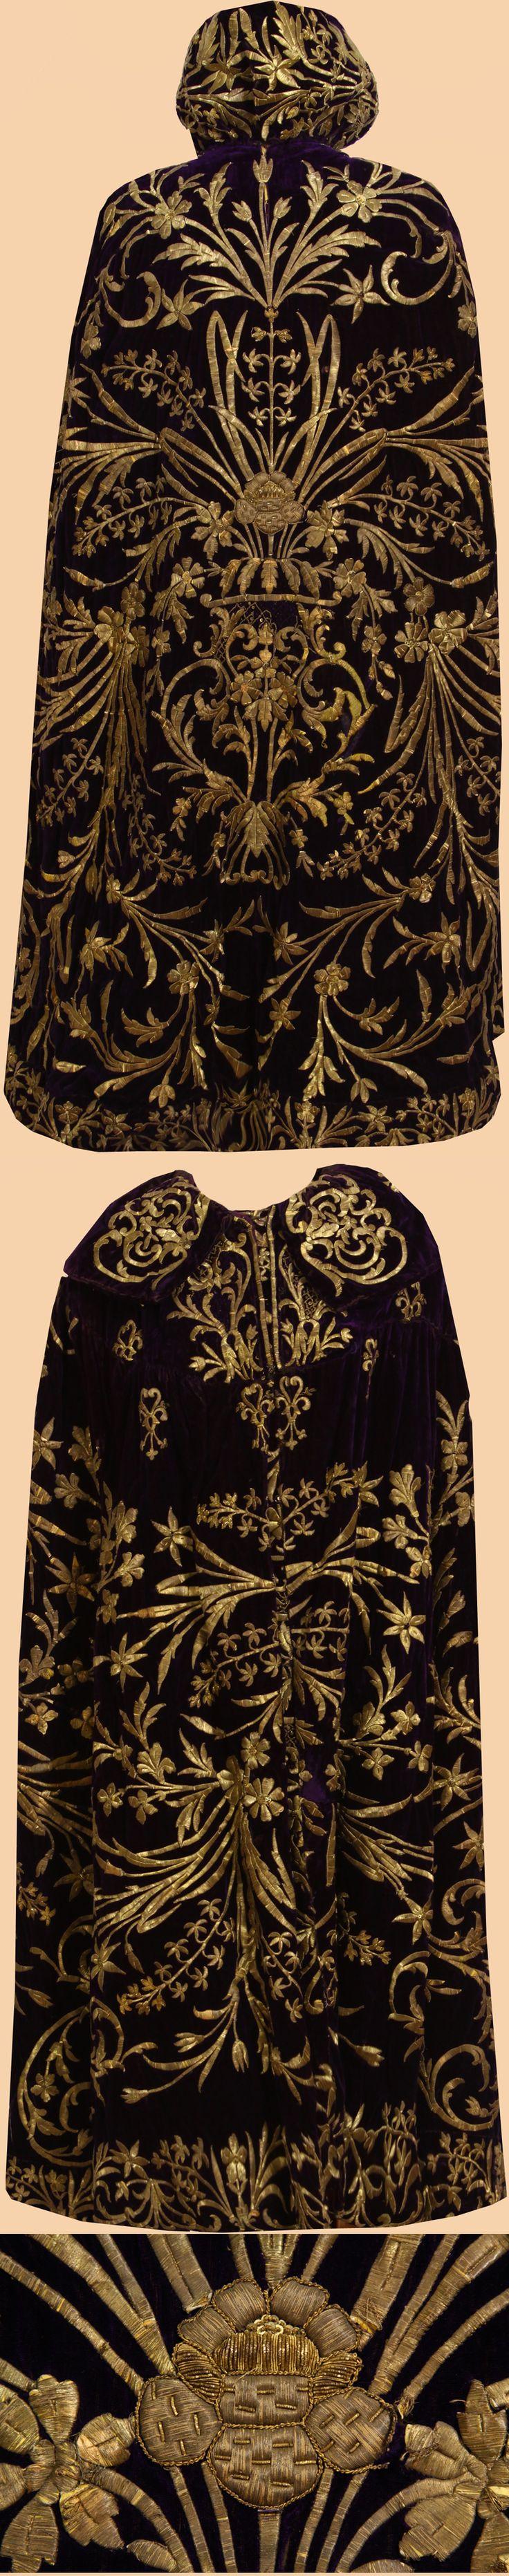 Ottoman Turkish Woman's Kaftan worn at Court, circa 1840 in the 'Shah's Pleasure' pattern.